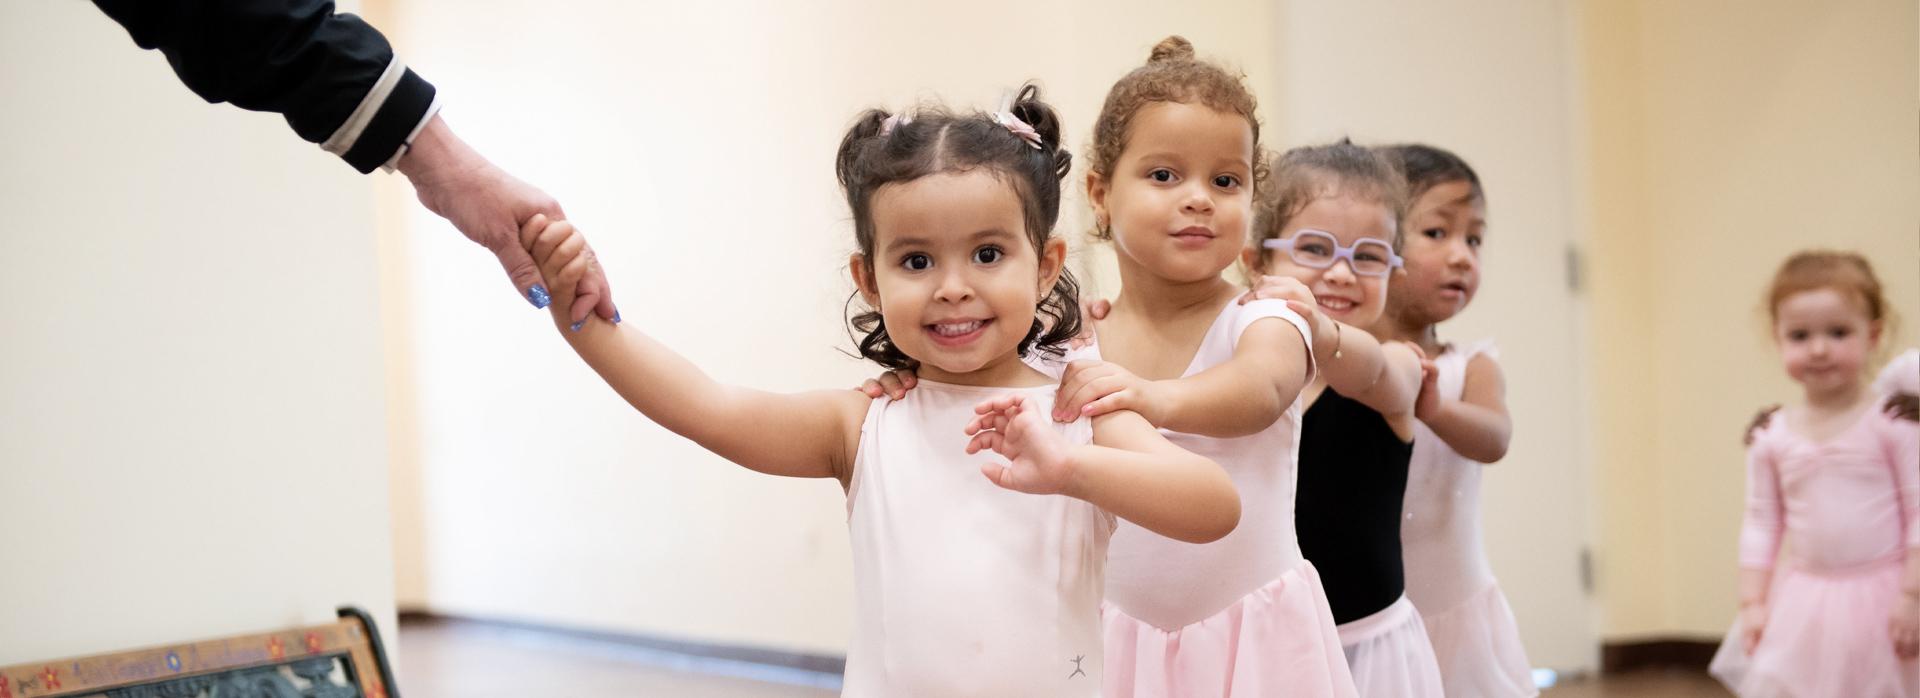 Be part of Broward Dance Programs Club School: Ballet, Jazz, Flamenco